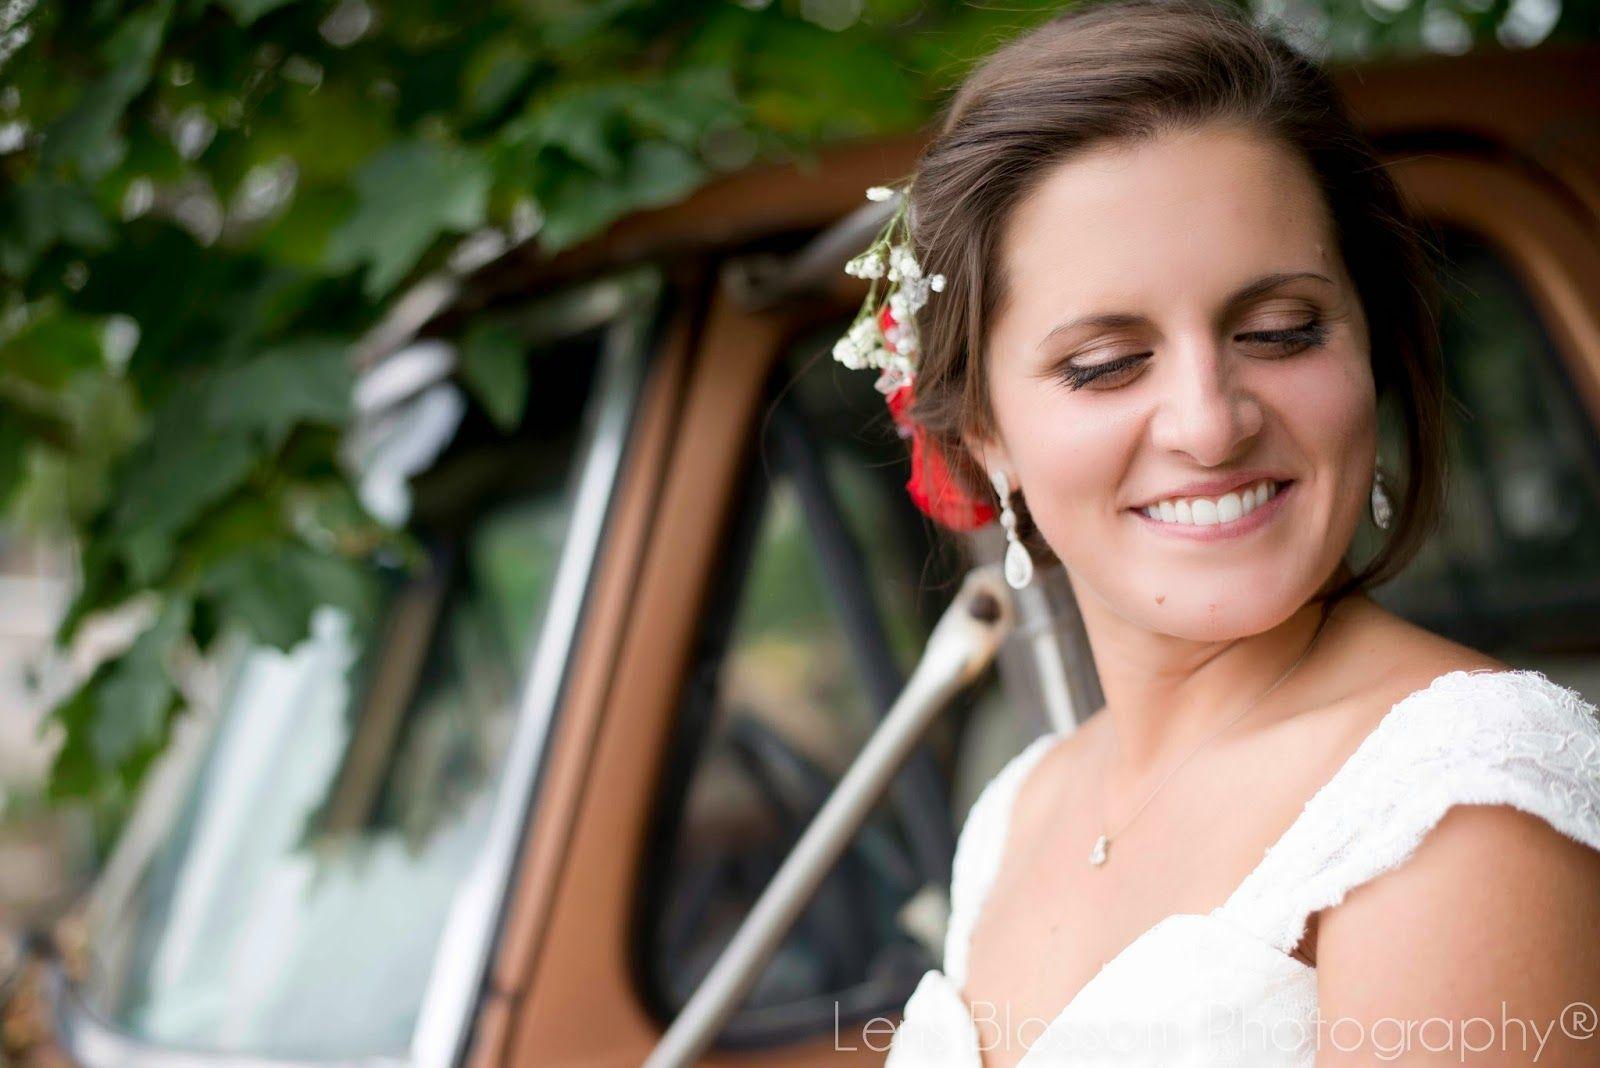 Lens Blossom Photography Bridal Ideas - Make her laugh!